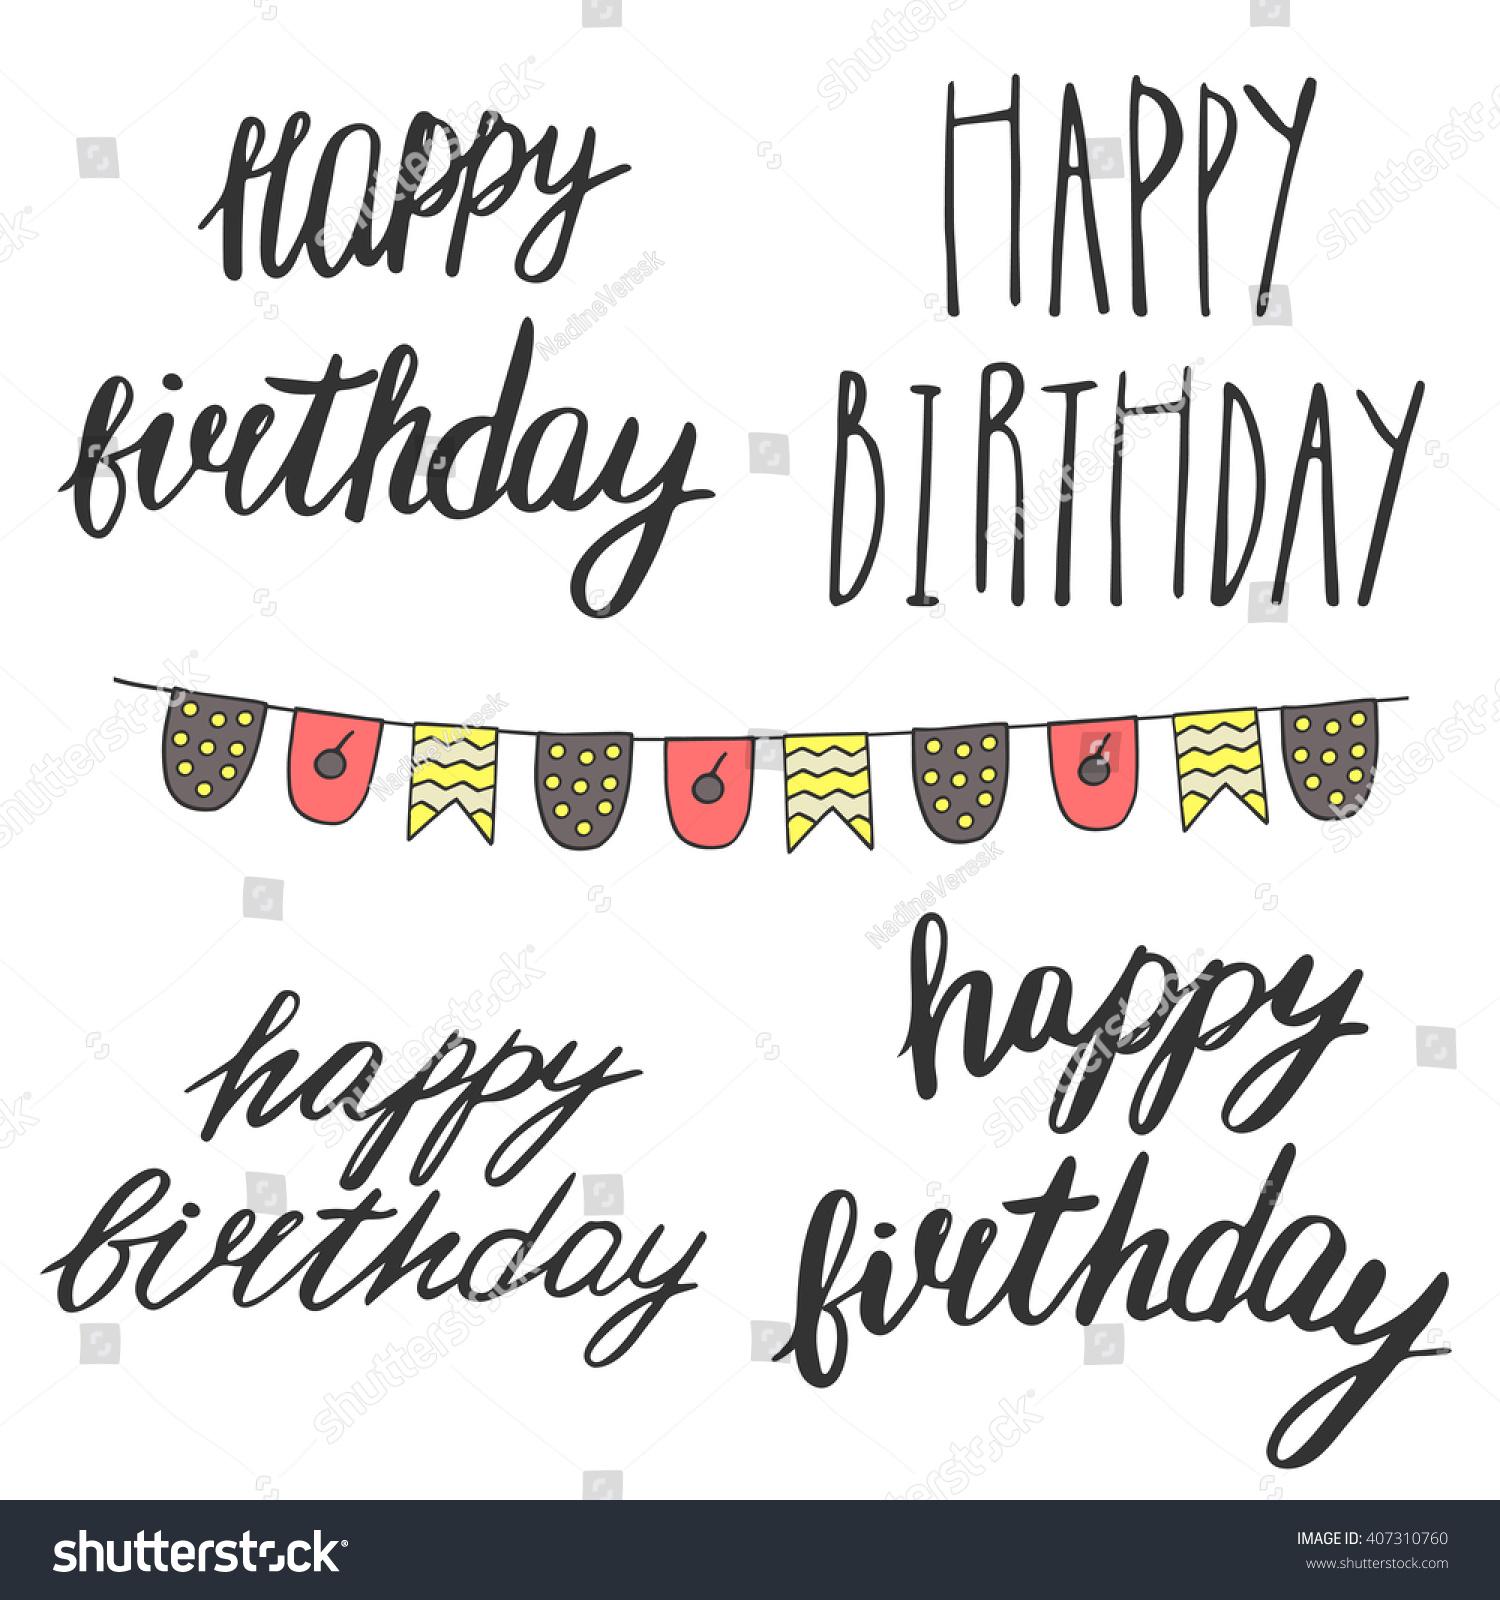 Hand Drawn Doodle Happy Birthday Quotes Stock Vector